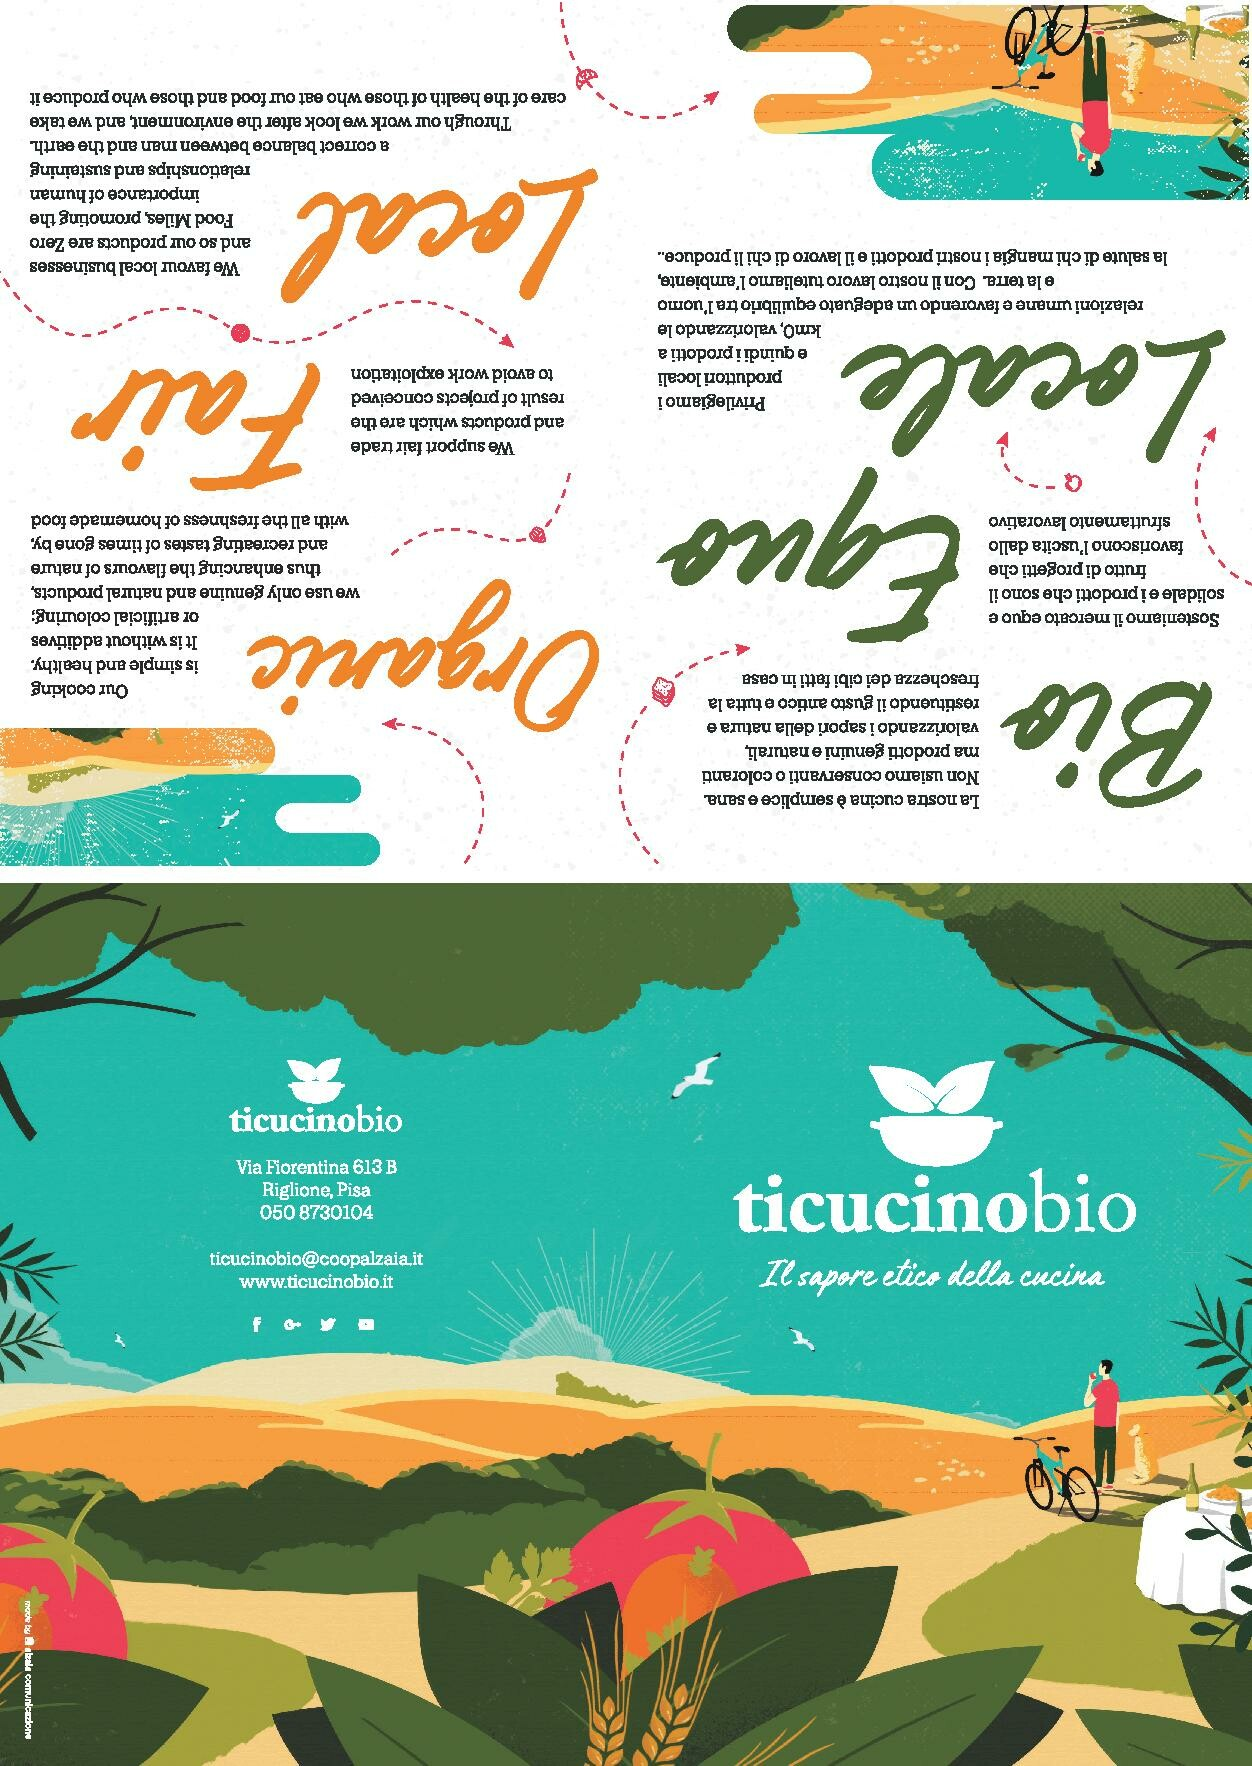 Marco baccioli ticucinobio front 1 3 tc page 001